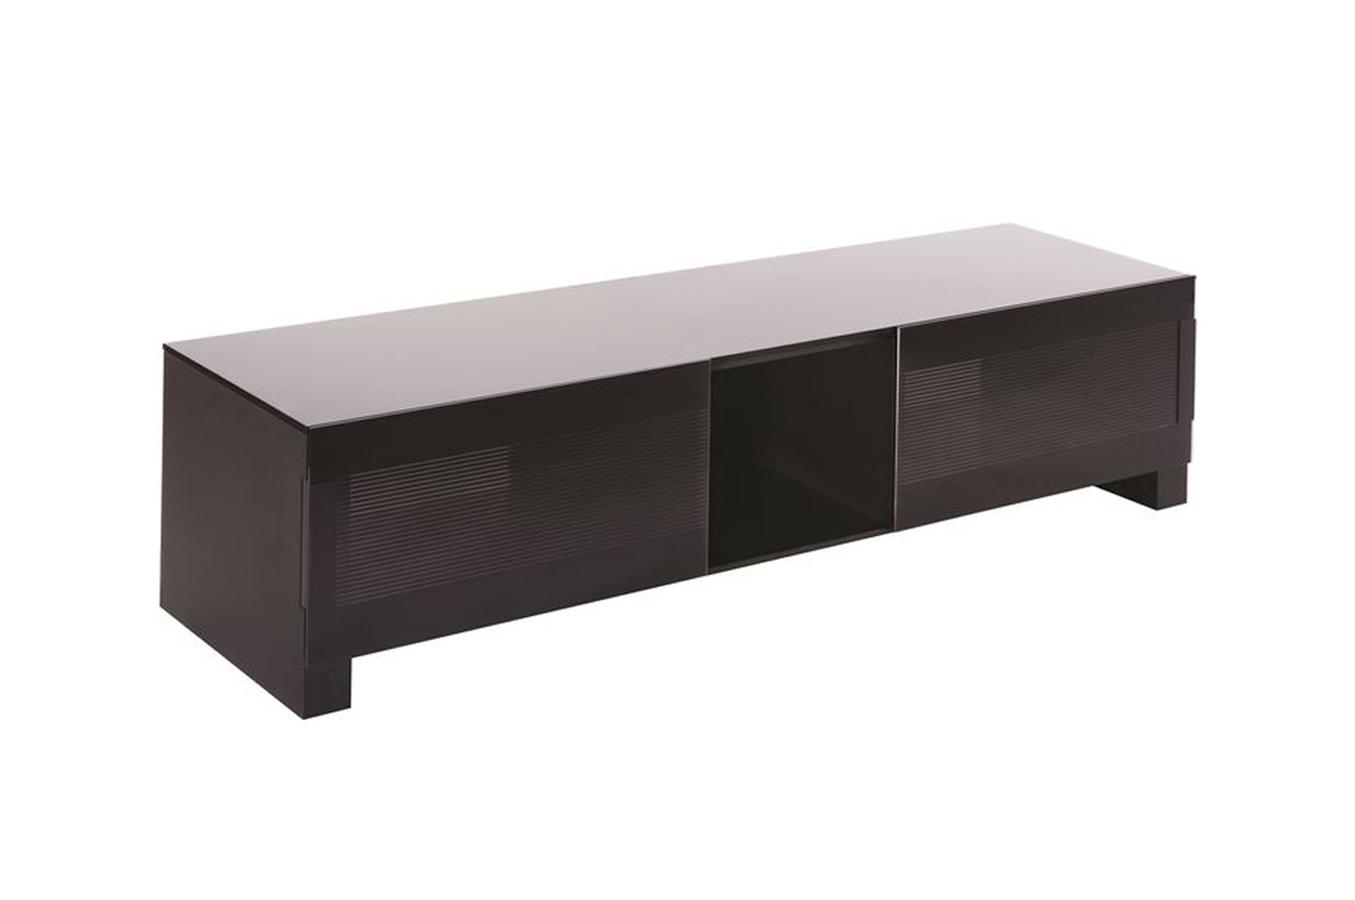 darty meuble tv dangle – Artzein.com